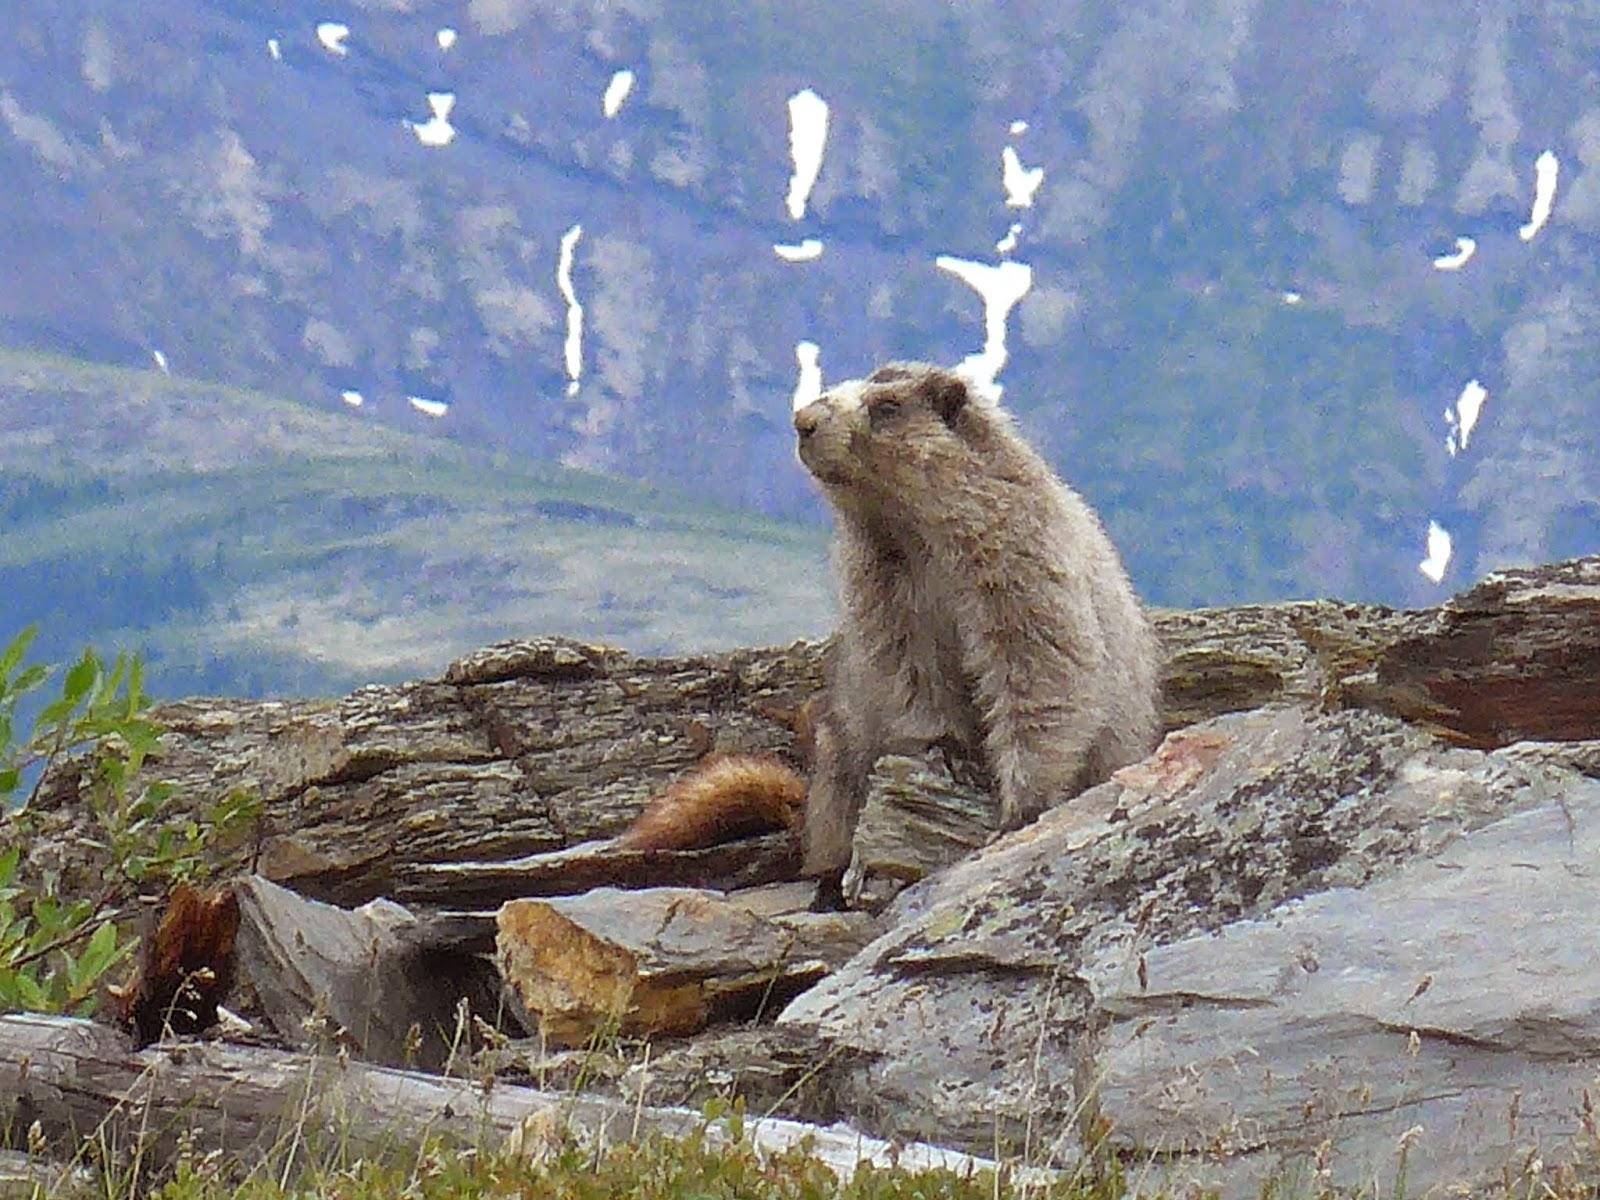 Hairy Marmot